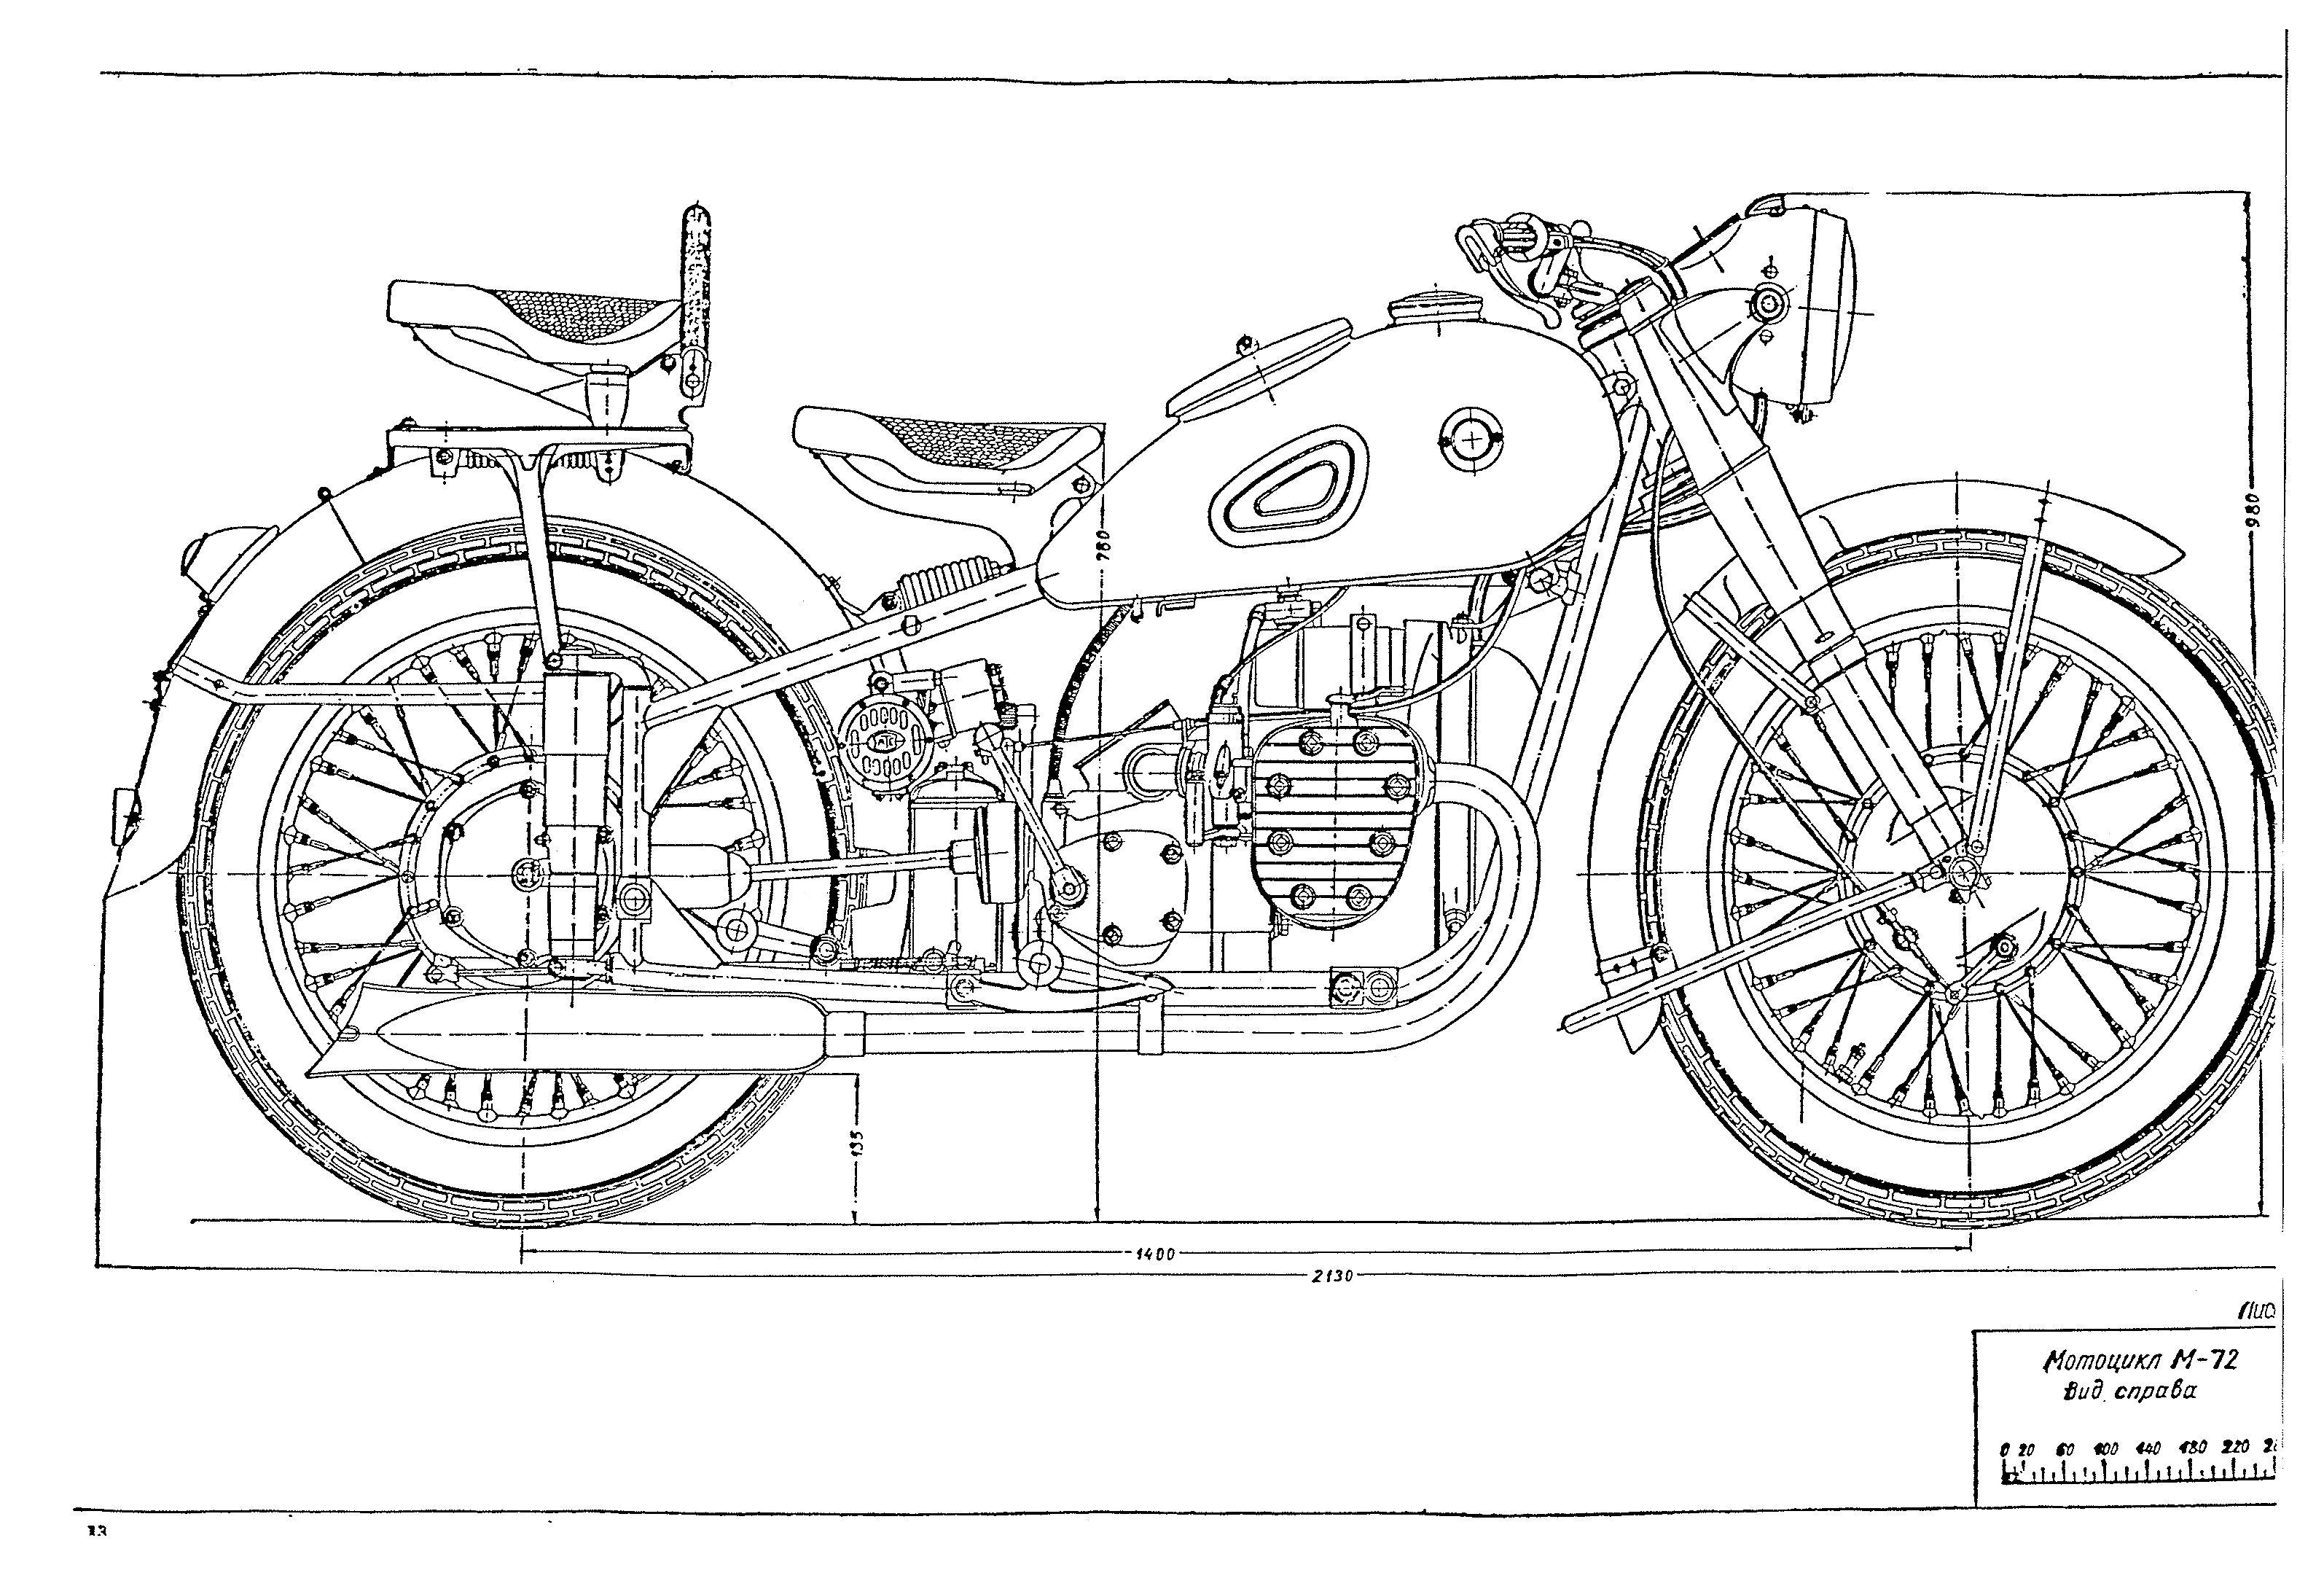 Motorcycle Blueprints